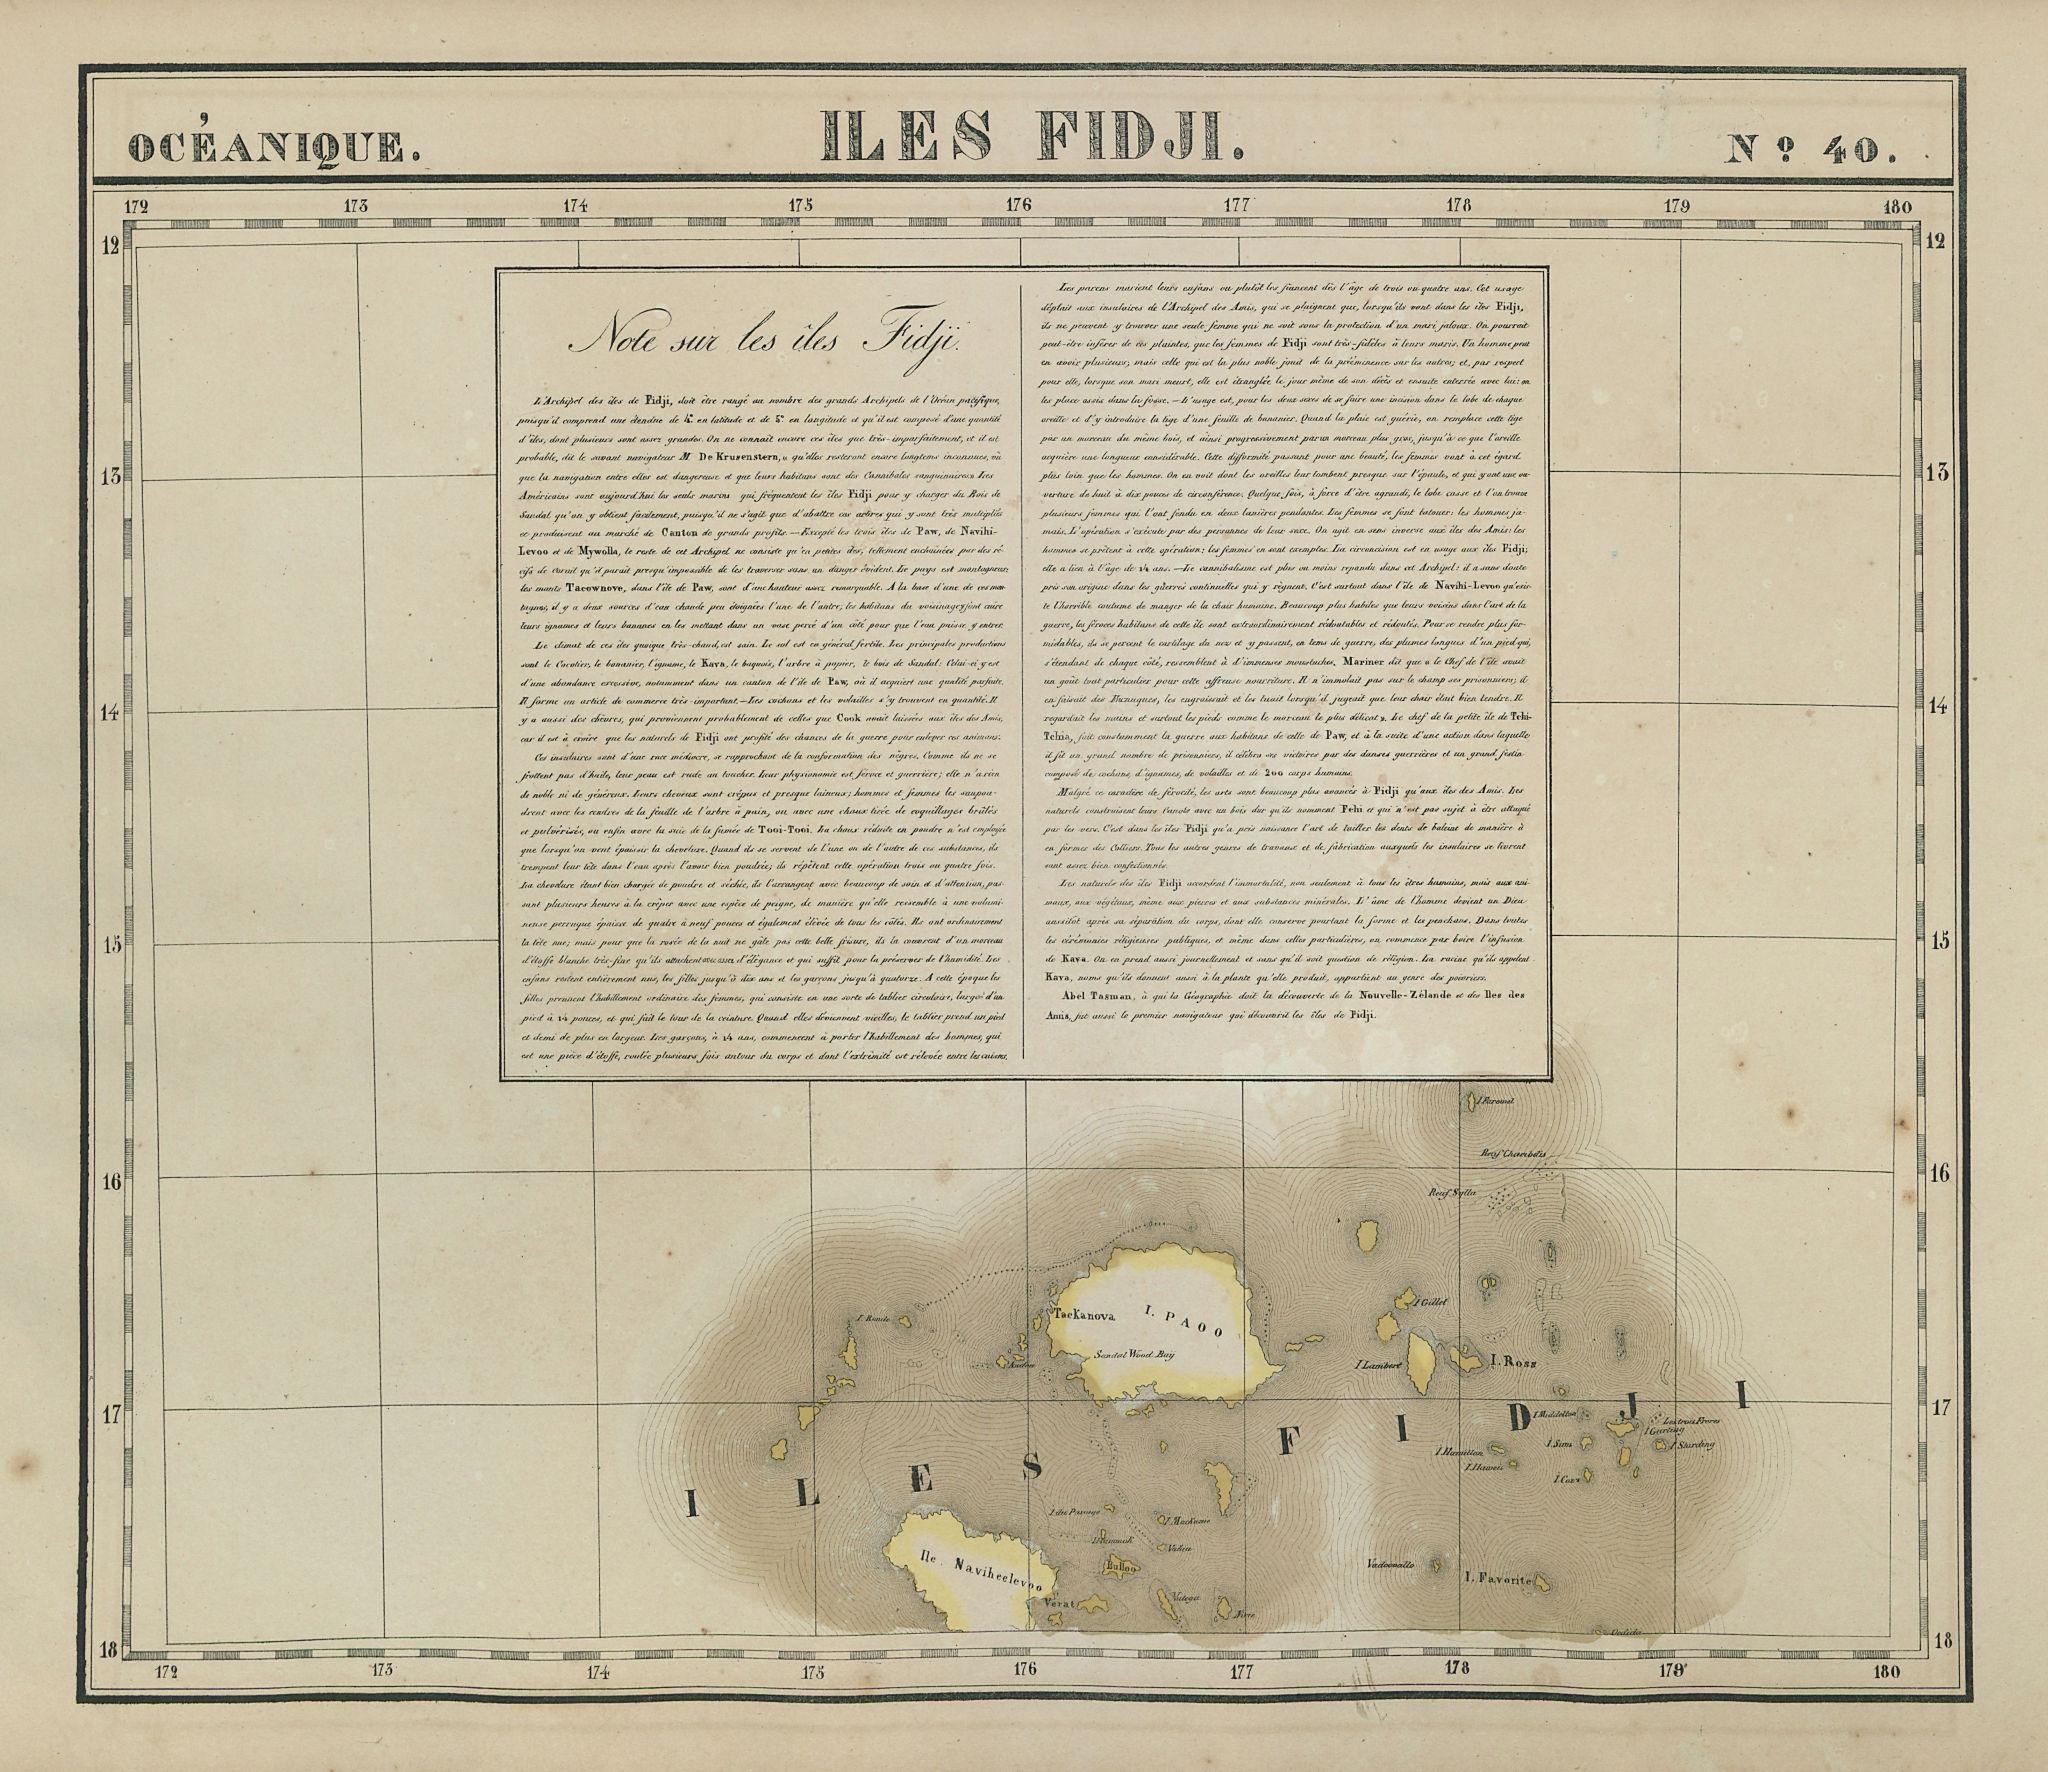 Océanique. Iles Fidji 40 Fiji islands Viti Levu Vanua Levu VANDERMAELEN 1827 map